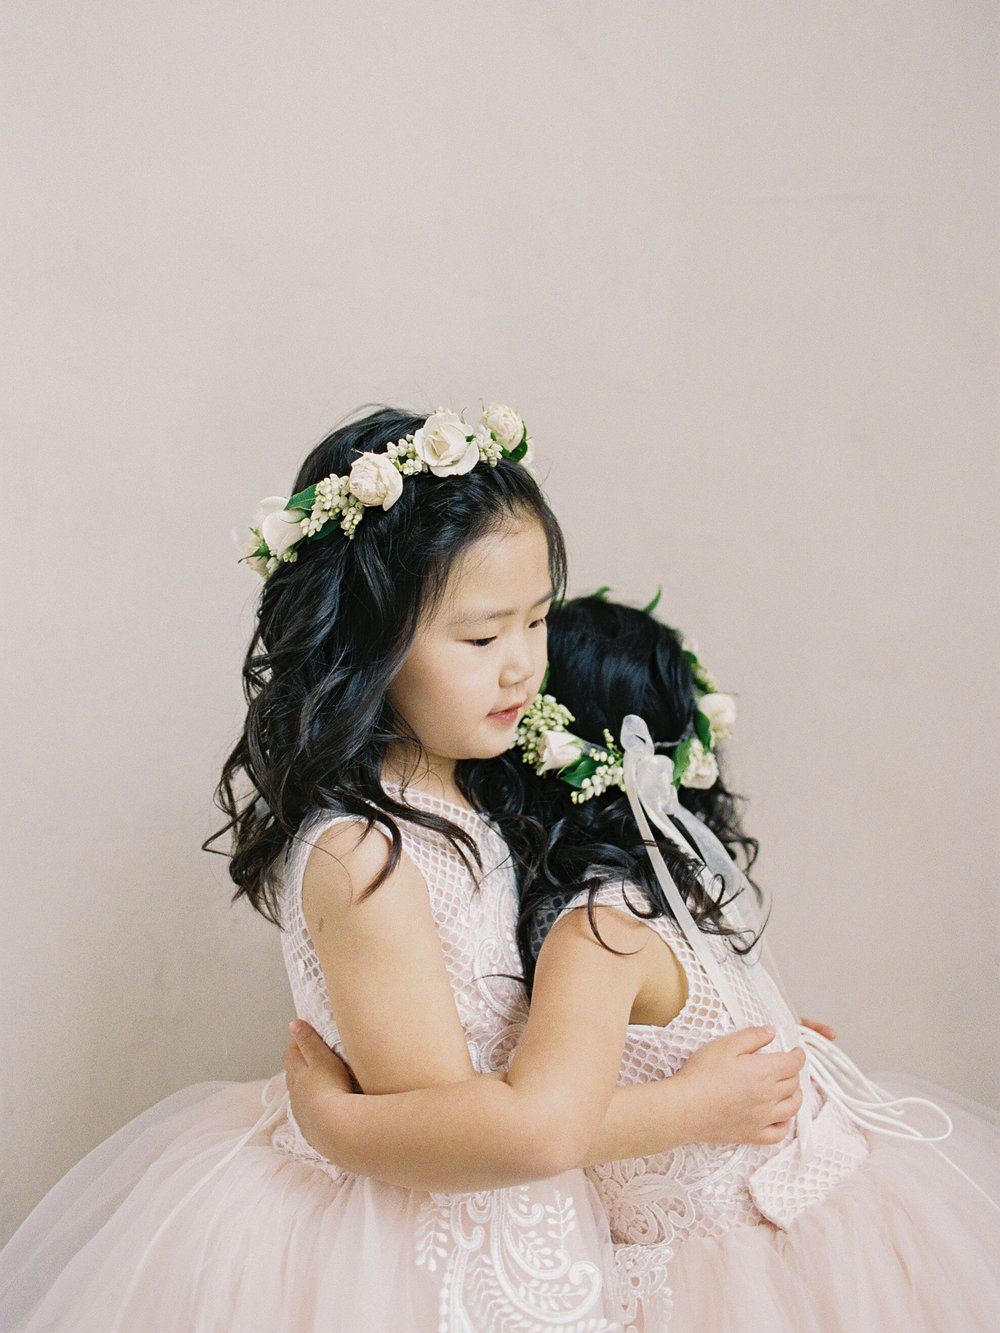 Athenaeum_Wedding_Hi_Res-9-Jen_Huang-005183-R1-029.jpg